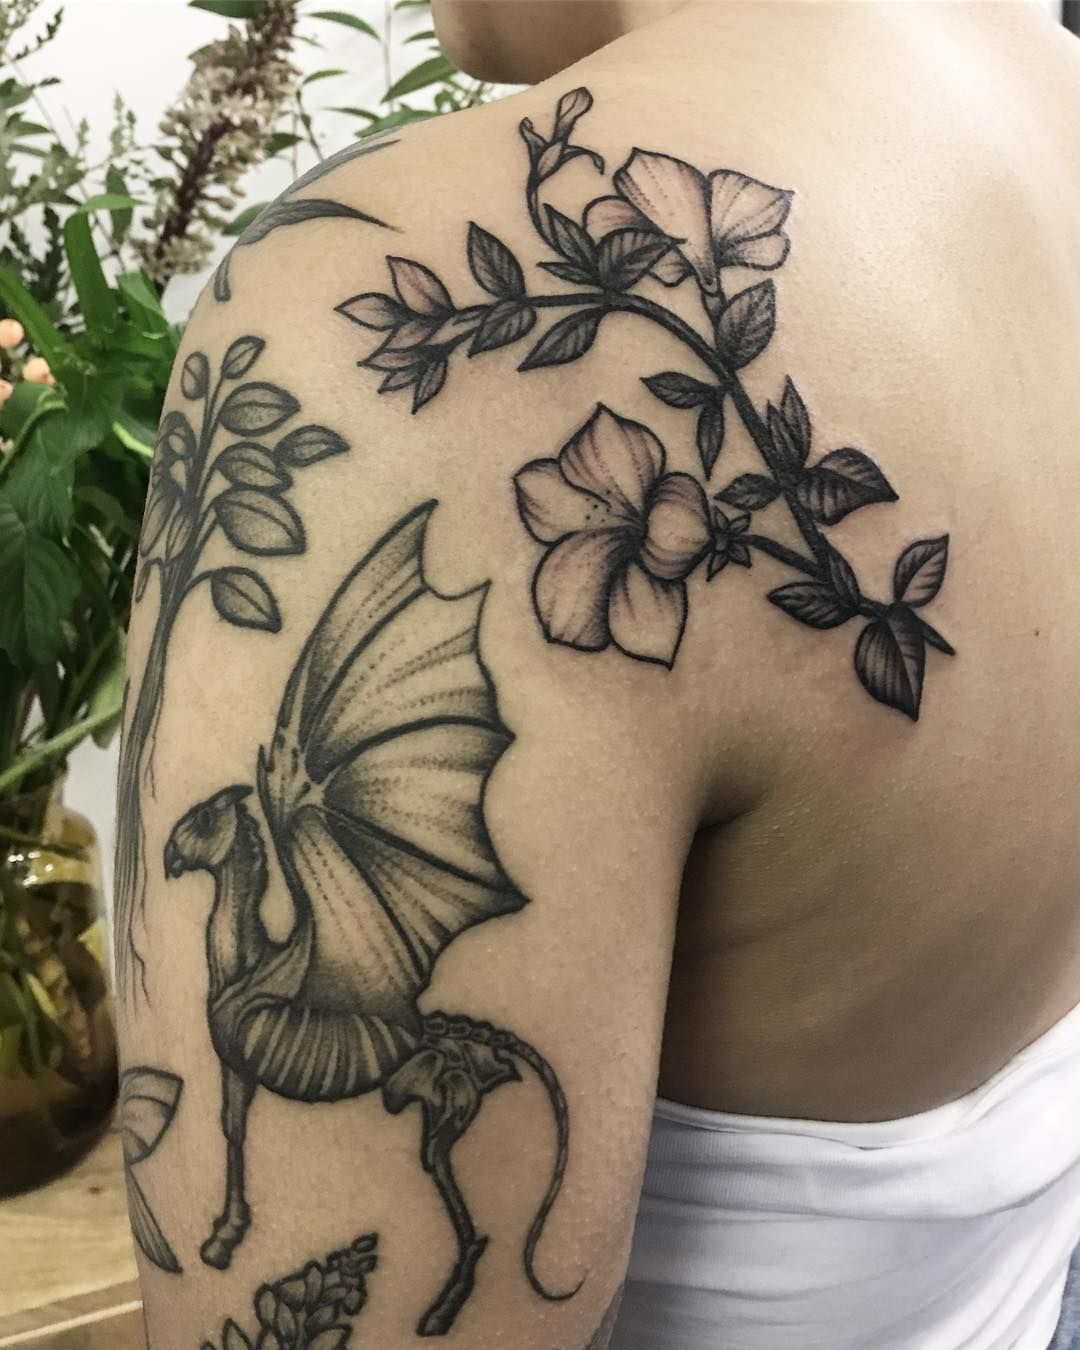 Added a petunia to ashleytysonarts harry potter arm